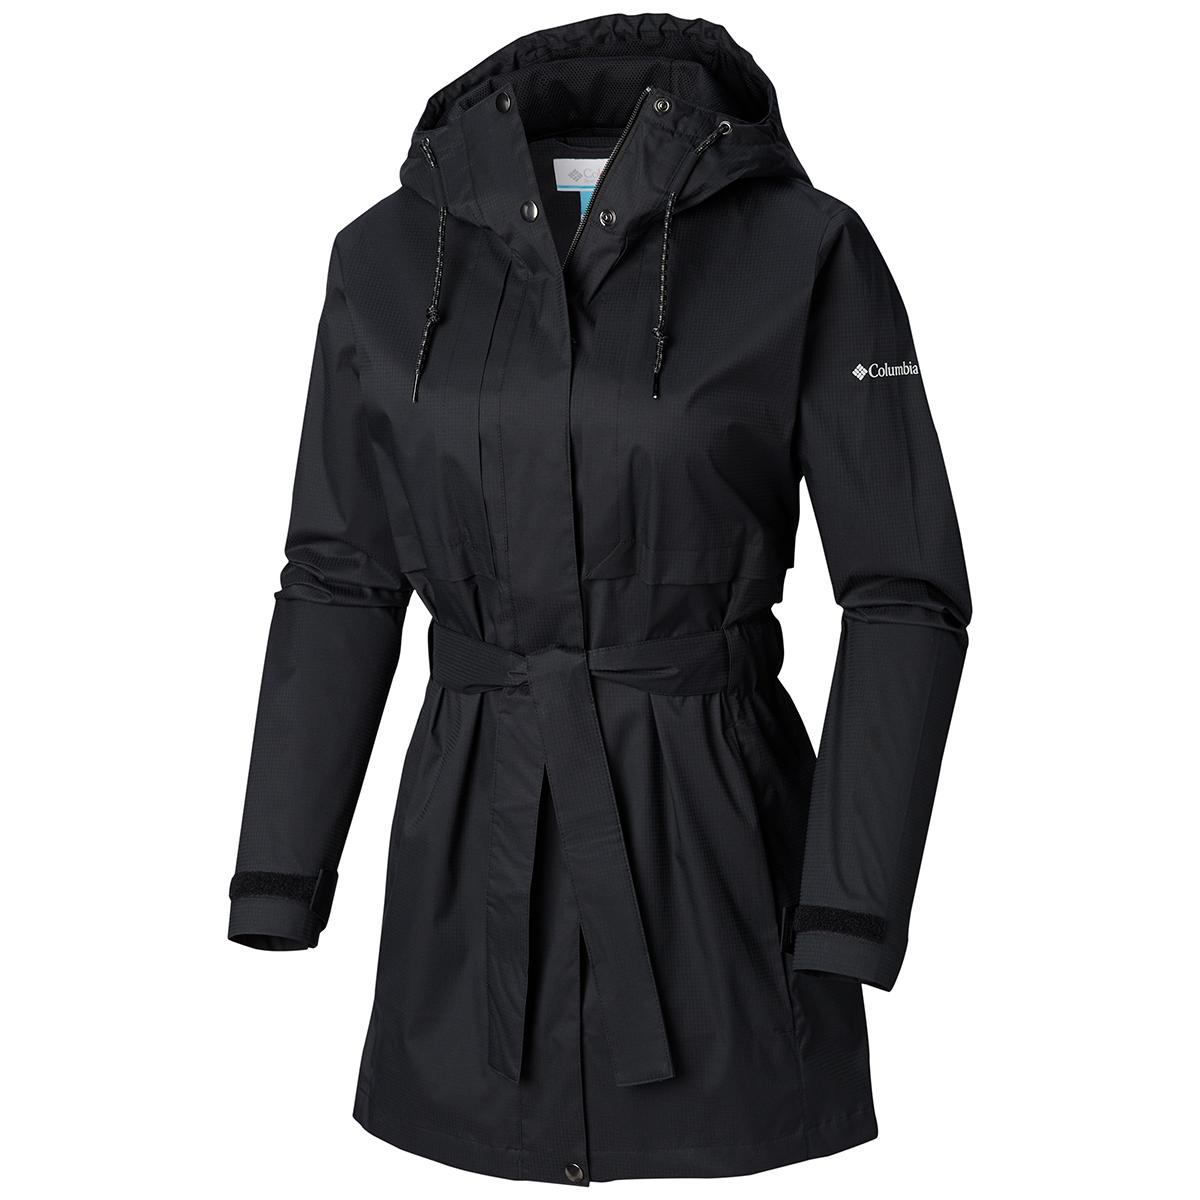 Columbia Women's Pardon My Trench Rain Jacket - Black, S